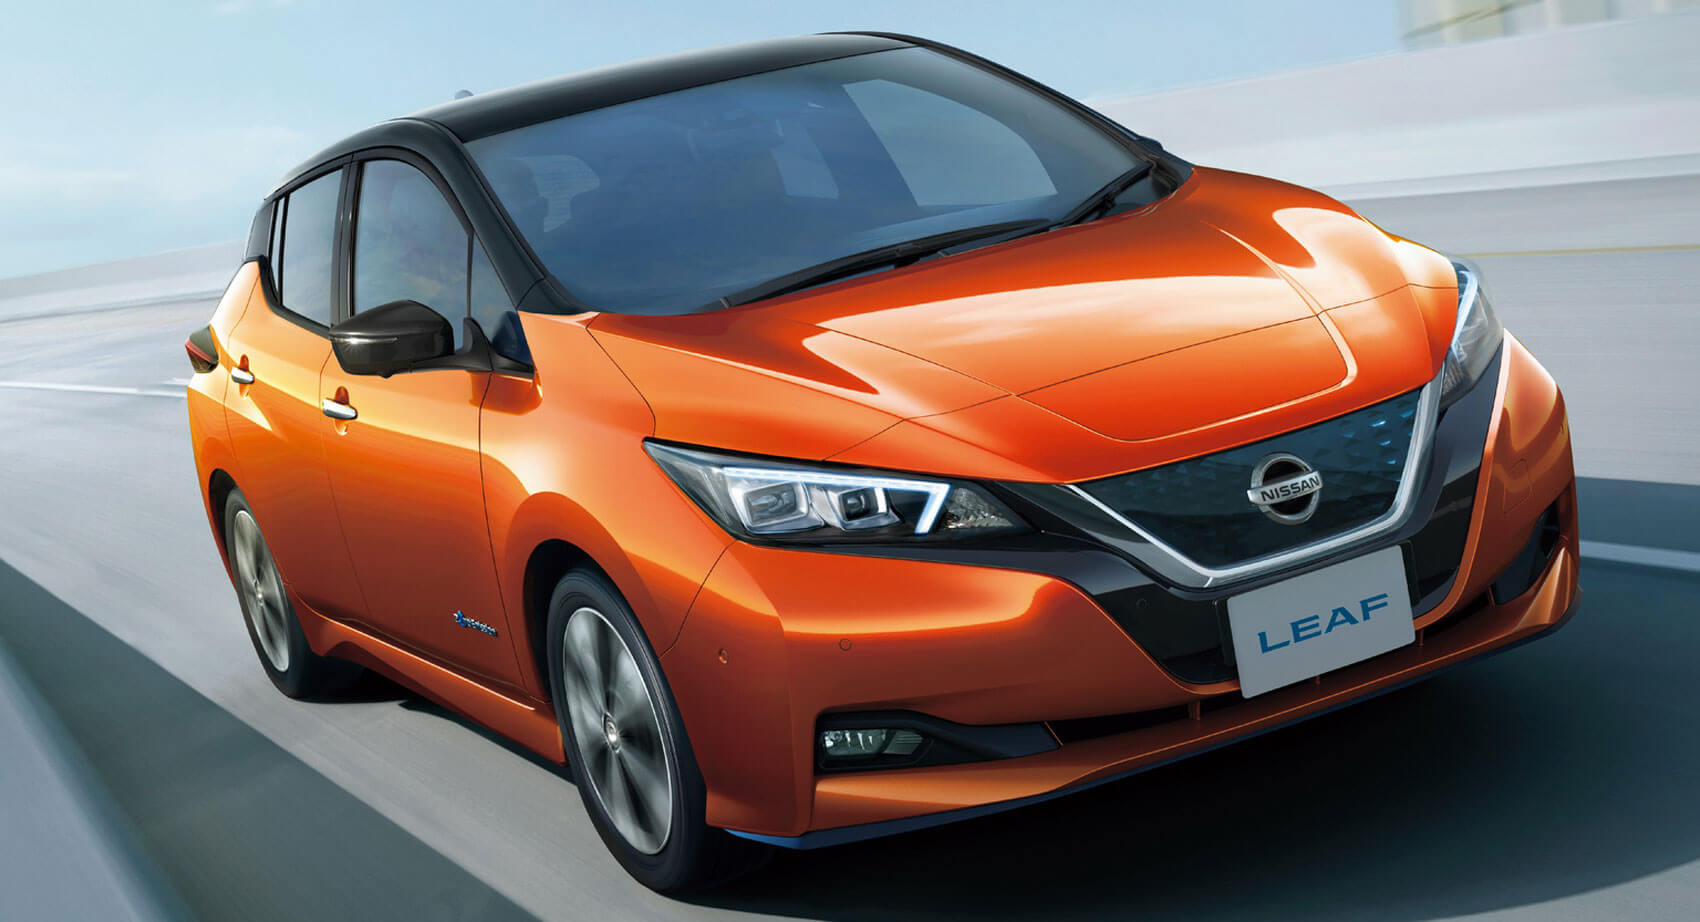 Nissan Leaf 2020 naranja en la carretera